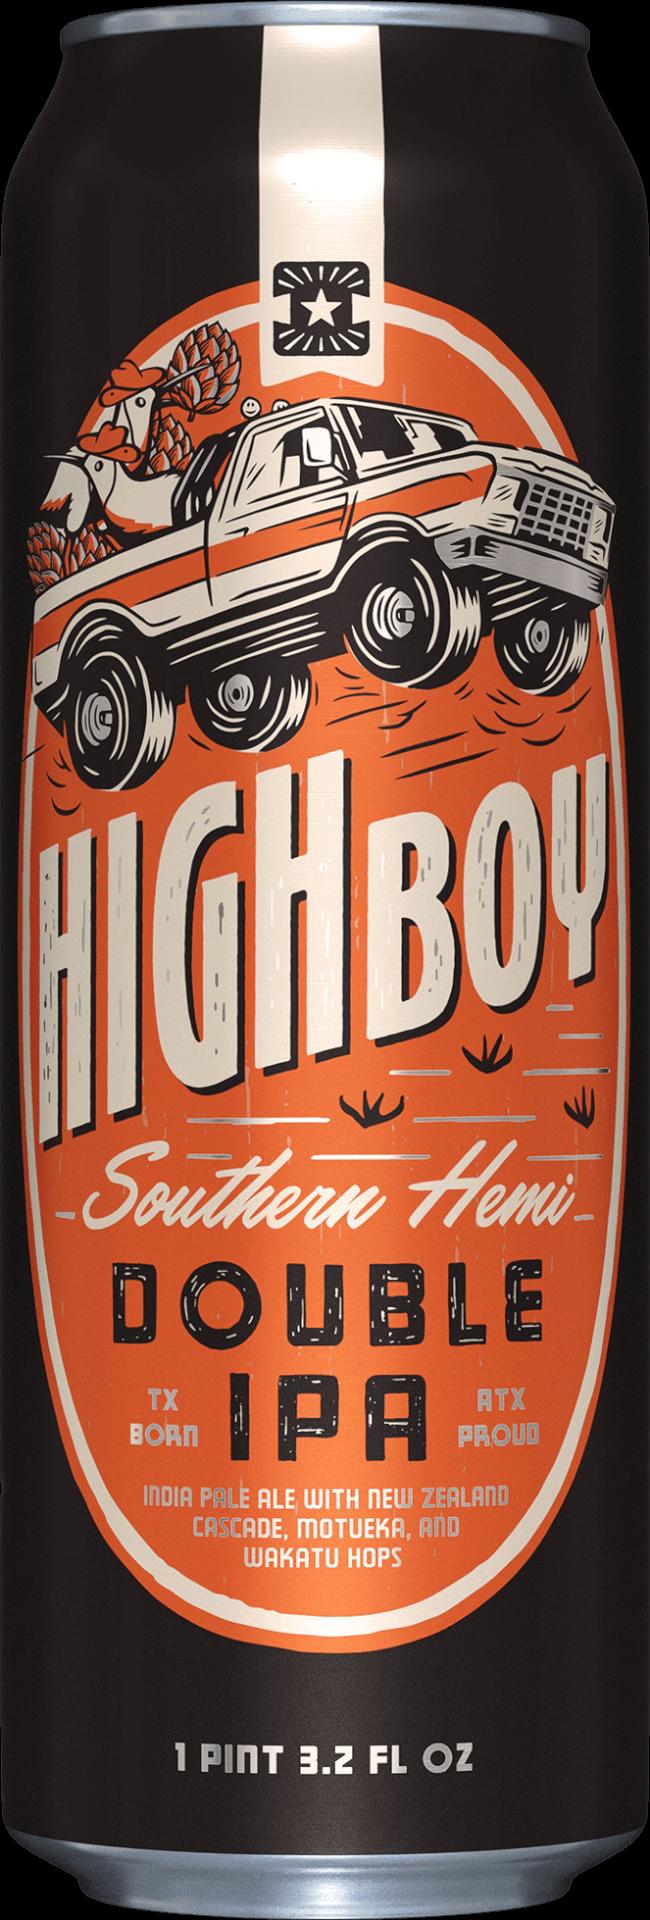 Highboy: Southern Hemi